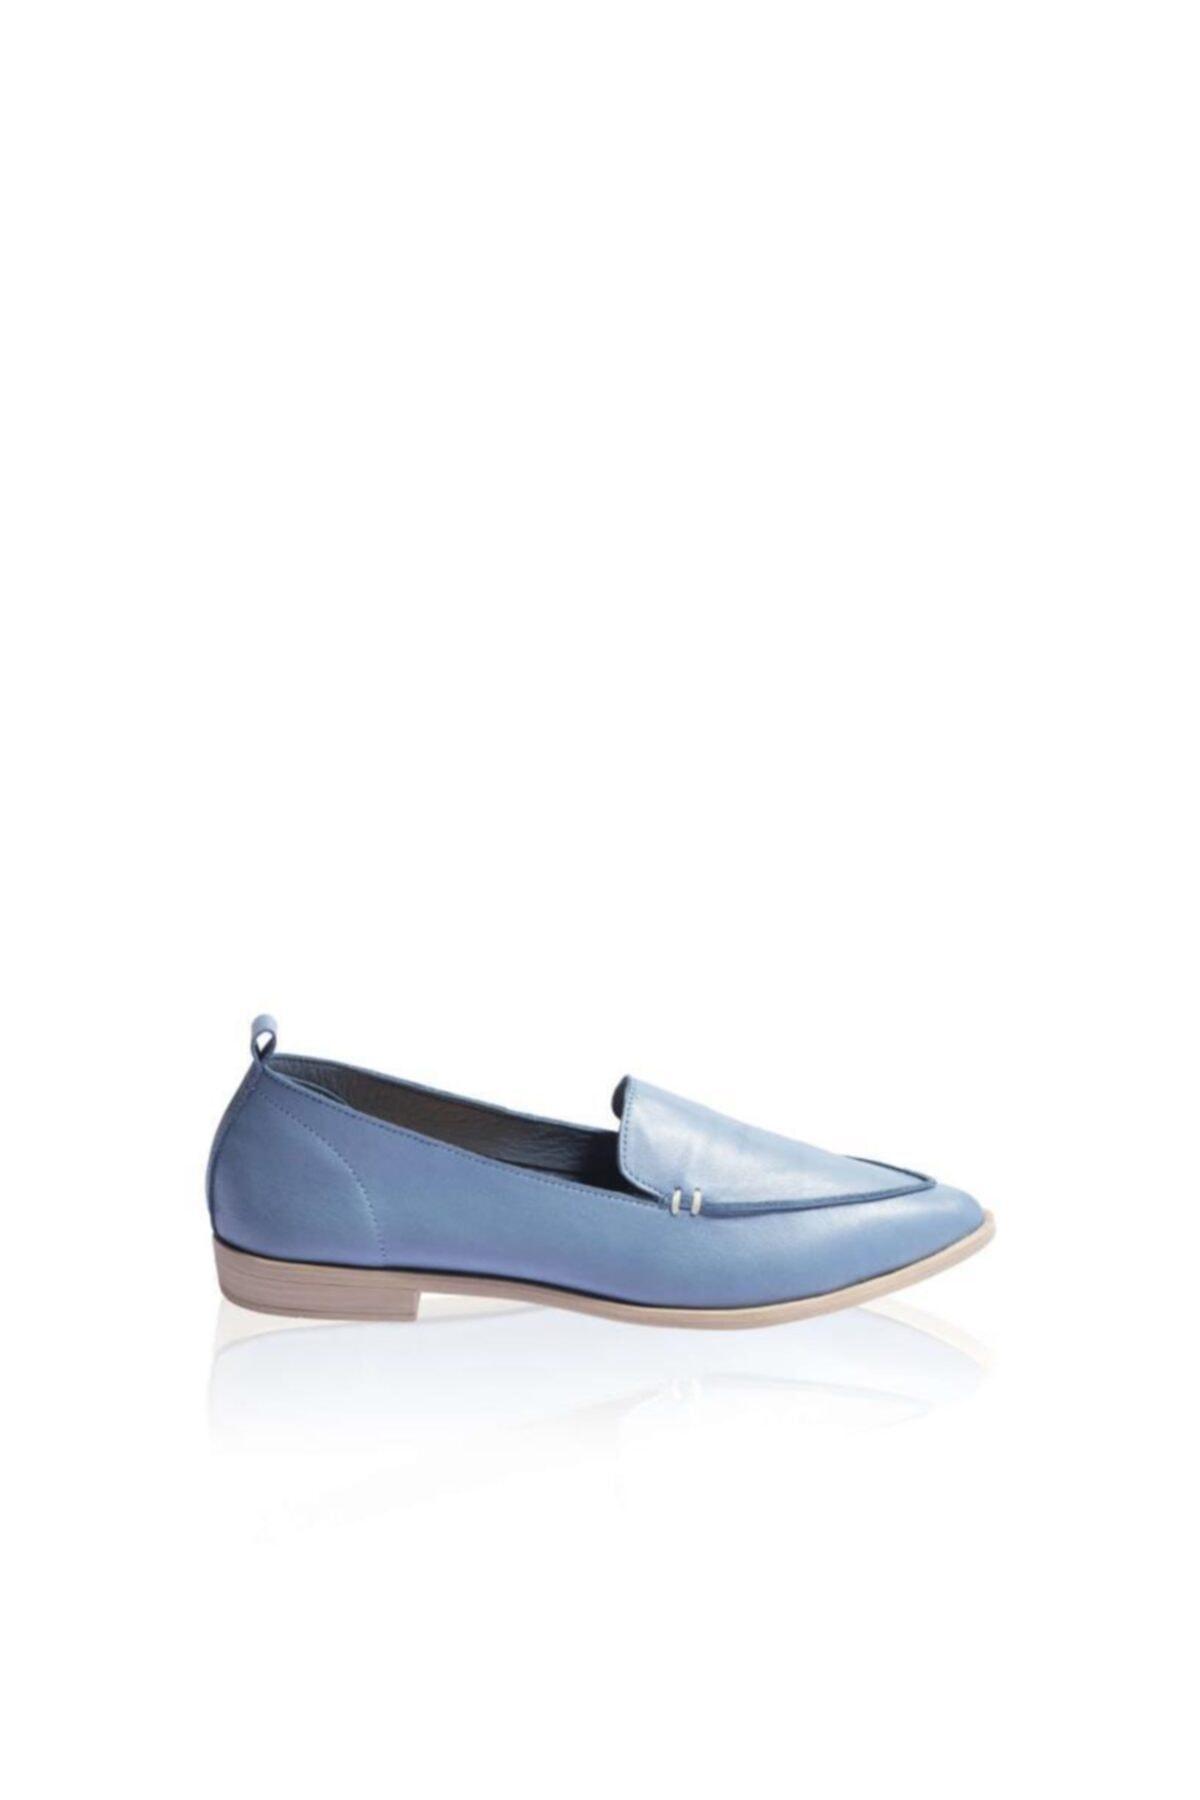 BUENO Shoes  Bayan Ayakkabı 9n0128 1